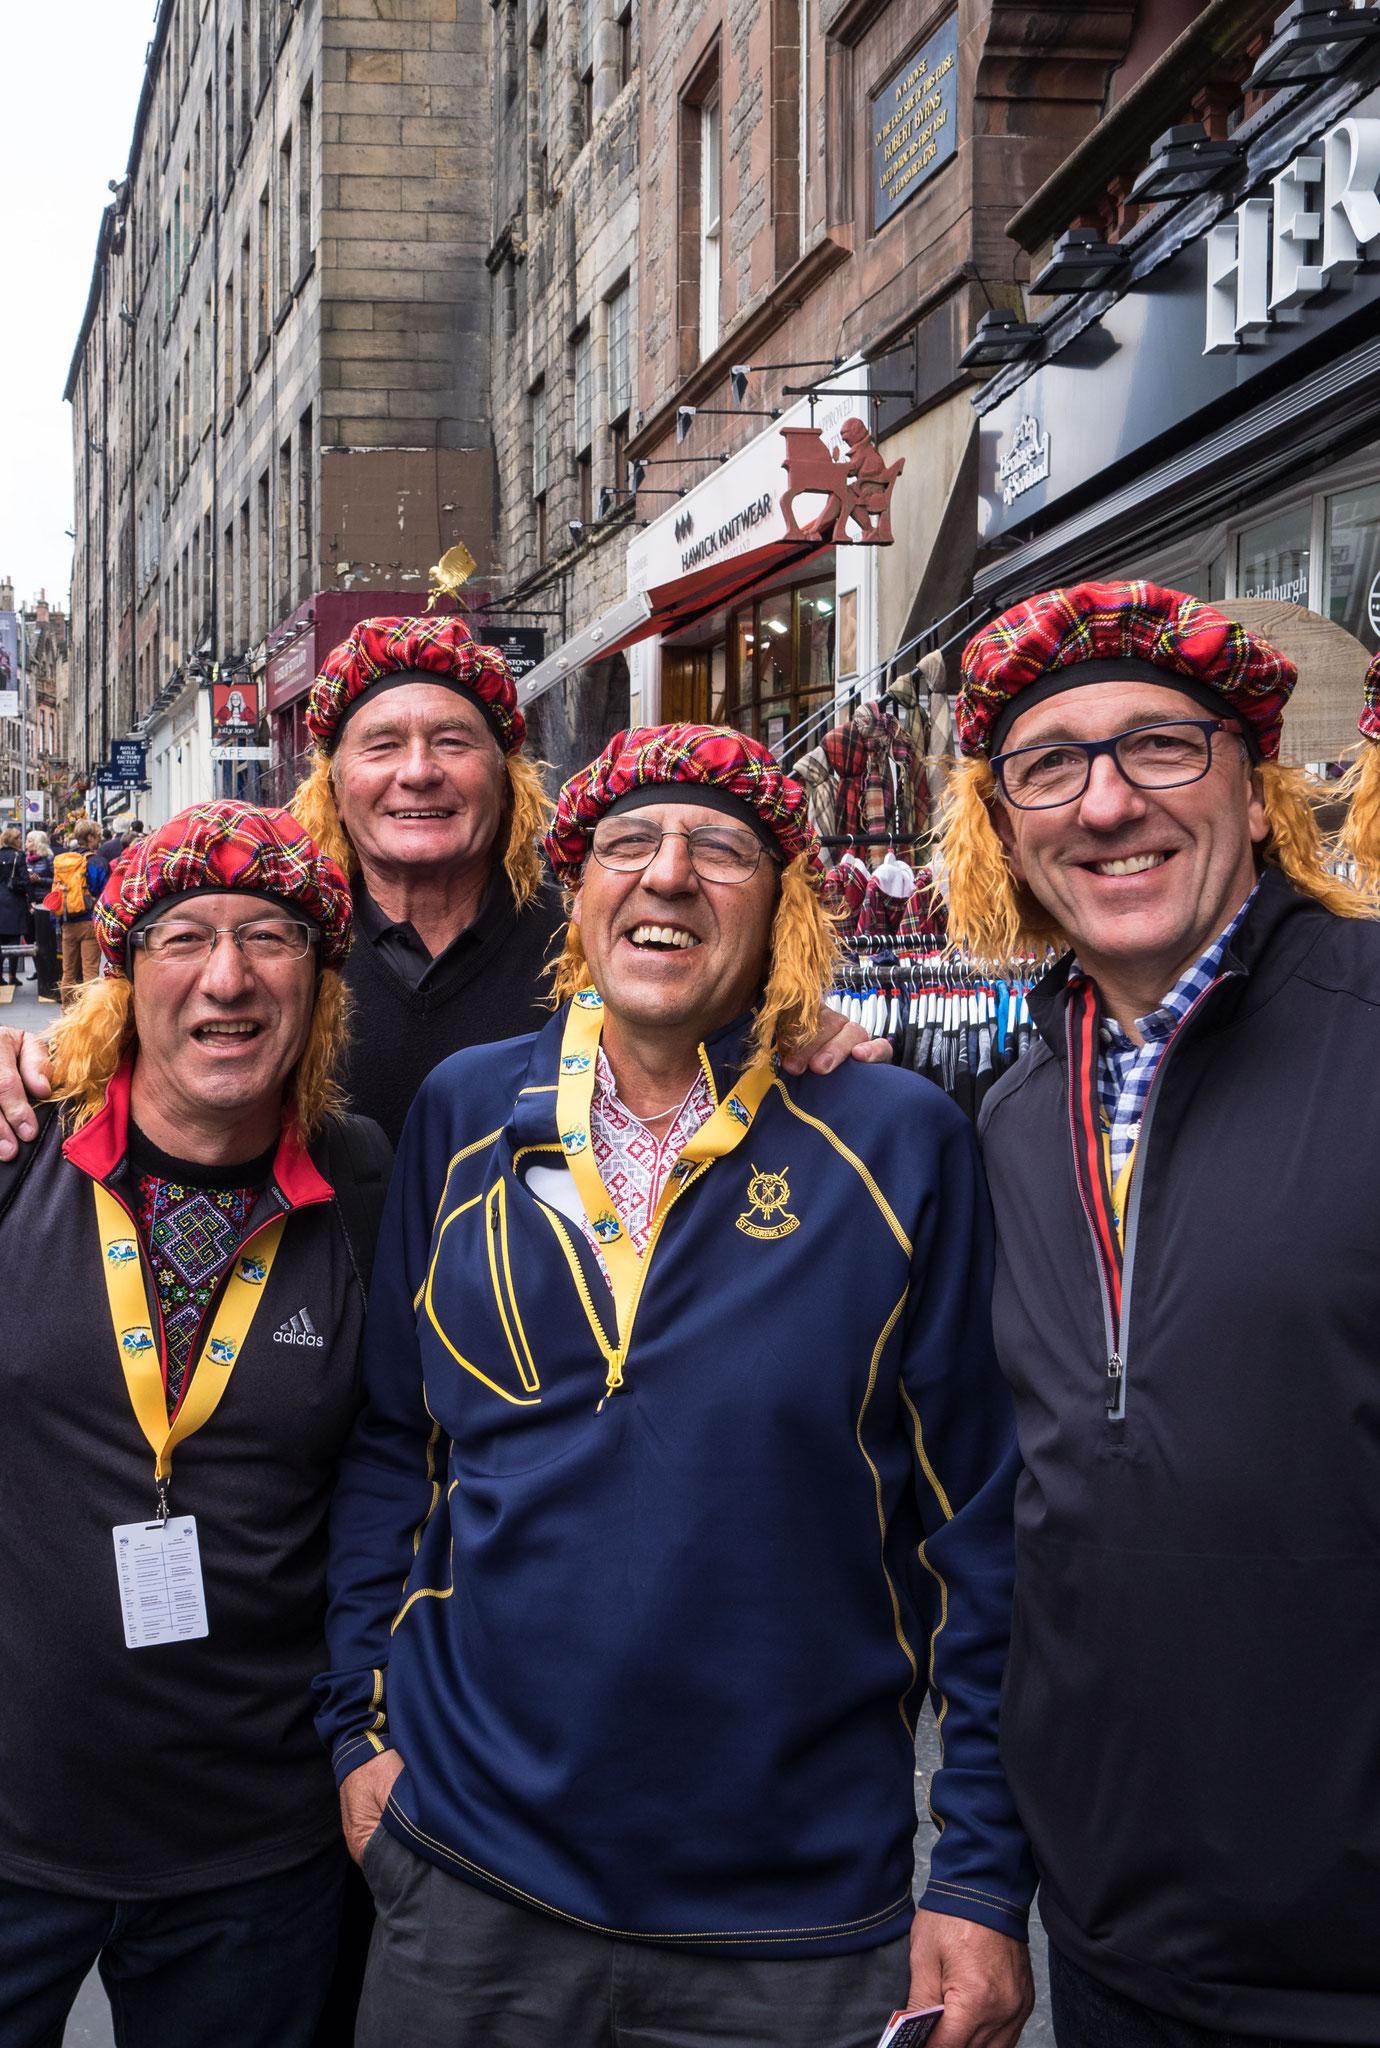 Bild: Edinburgh Touristen